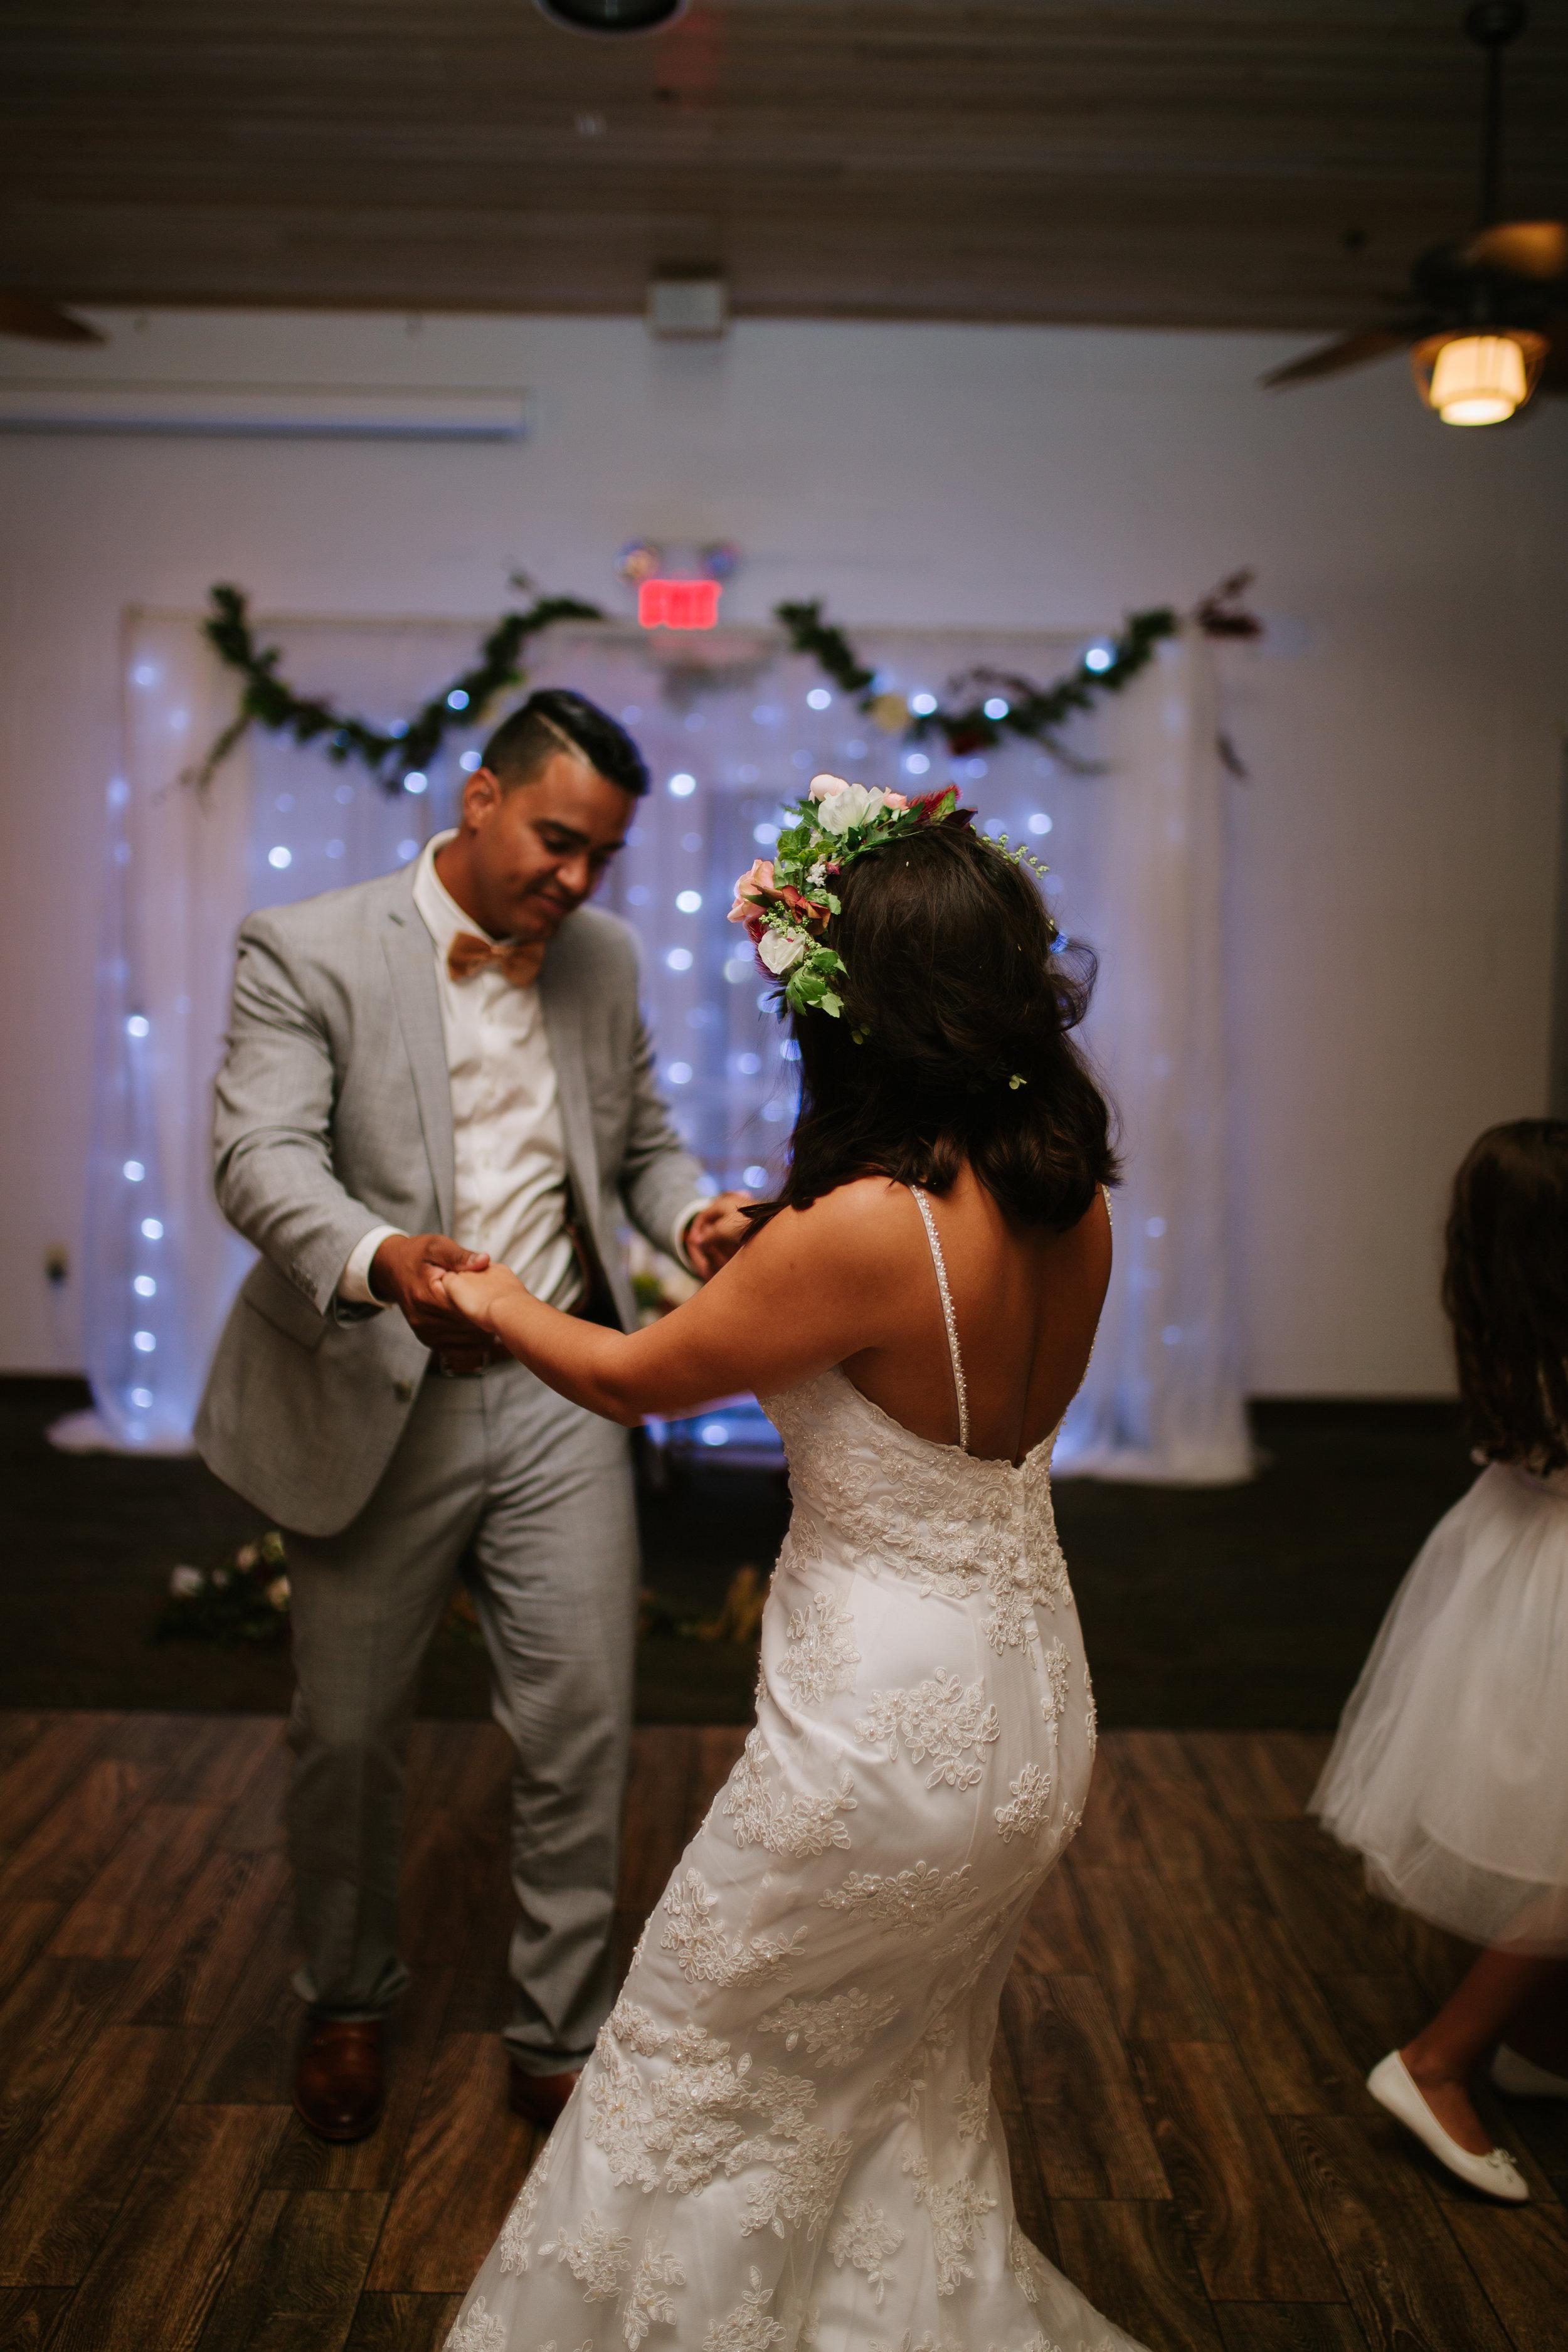 2017.05.23 Barbara and Mauricio Sales Port St Lucie Wedding (694 of 772).jpg